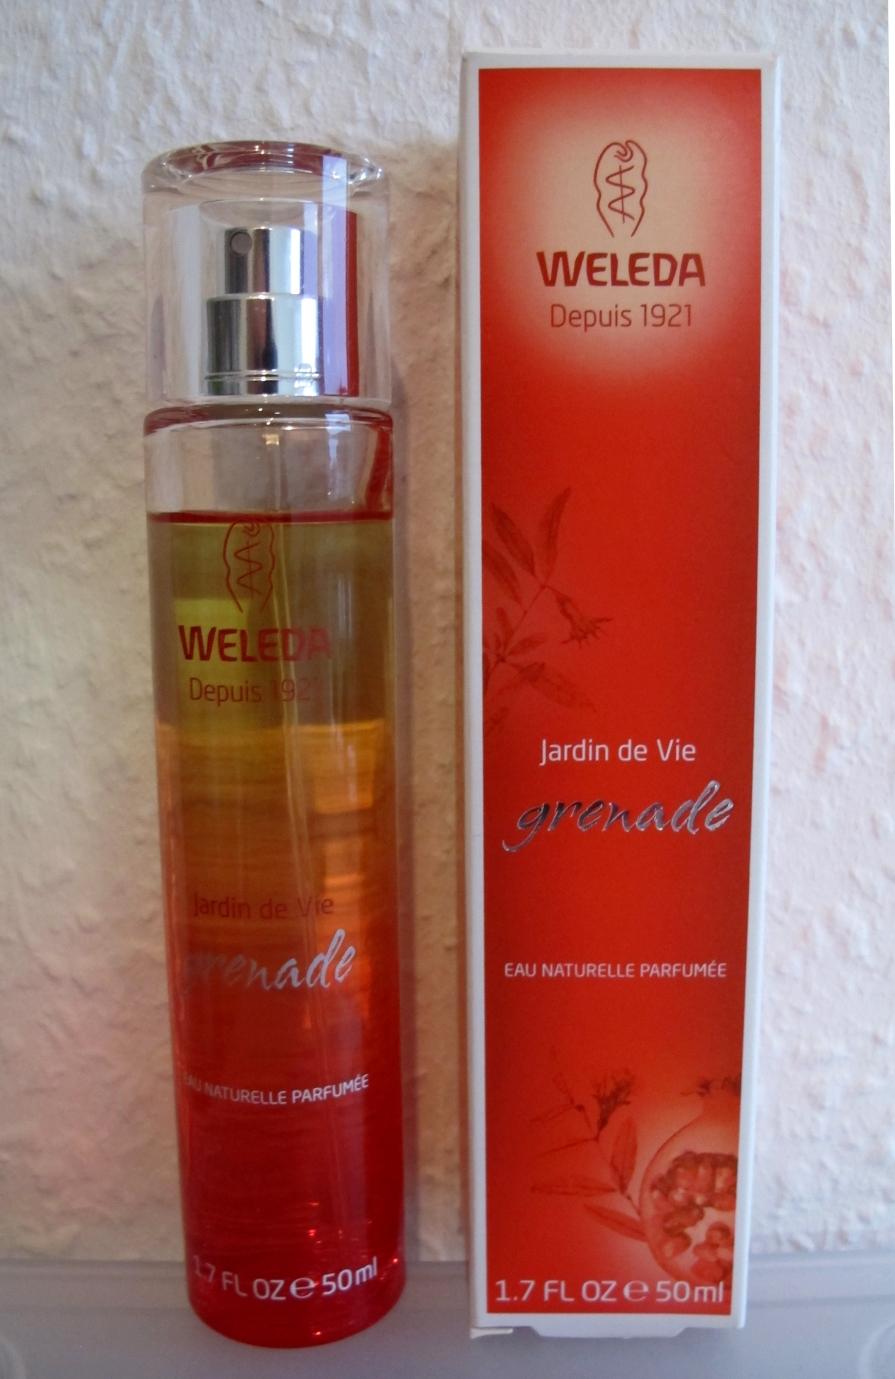 Weleda2